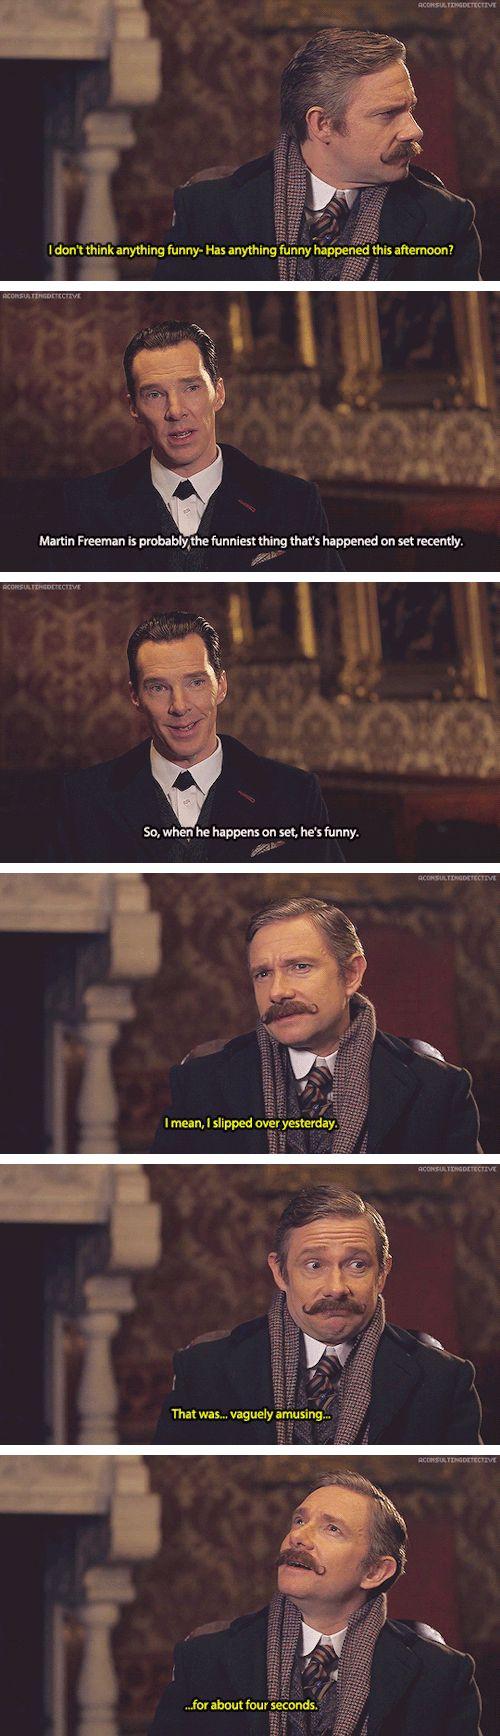 Sherlock: Martin Freeman and Benedict Cumberbatch